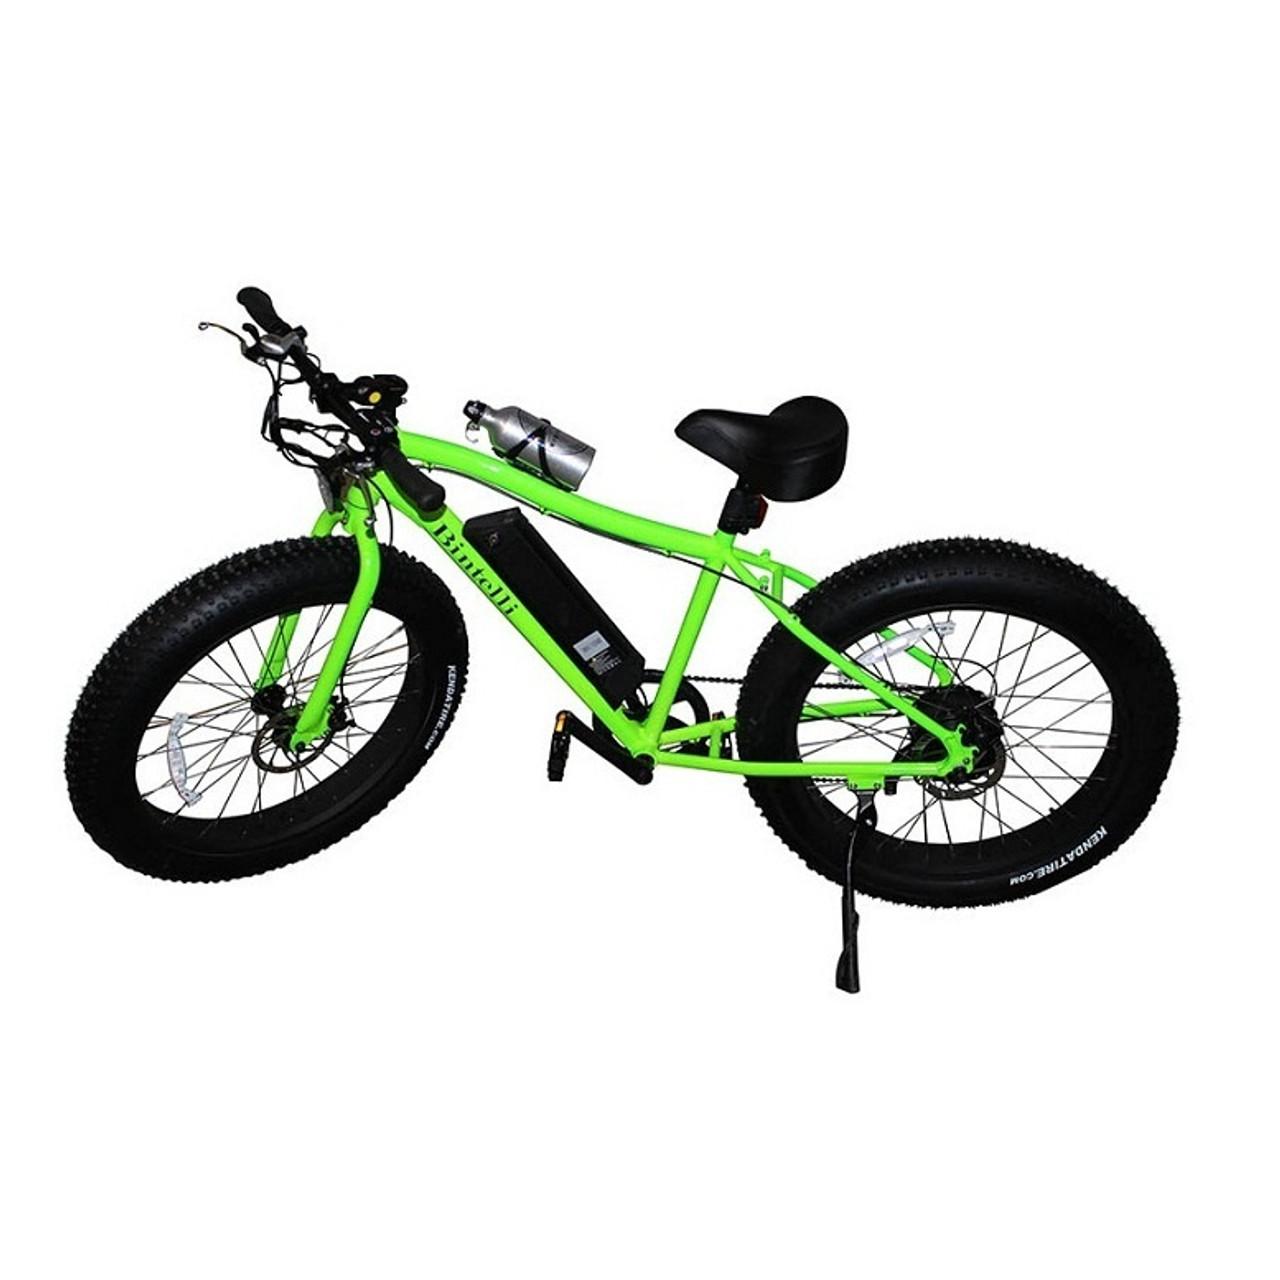 Bintelli M2 Fat Tire Mountain Electric Bicycle